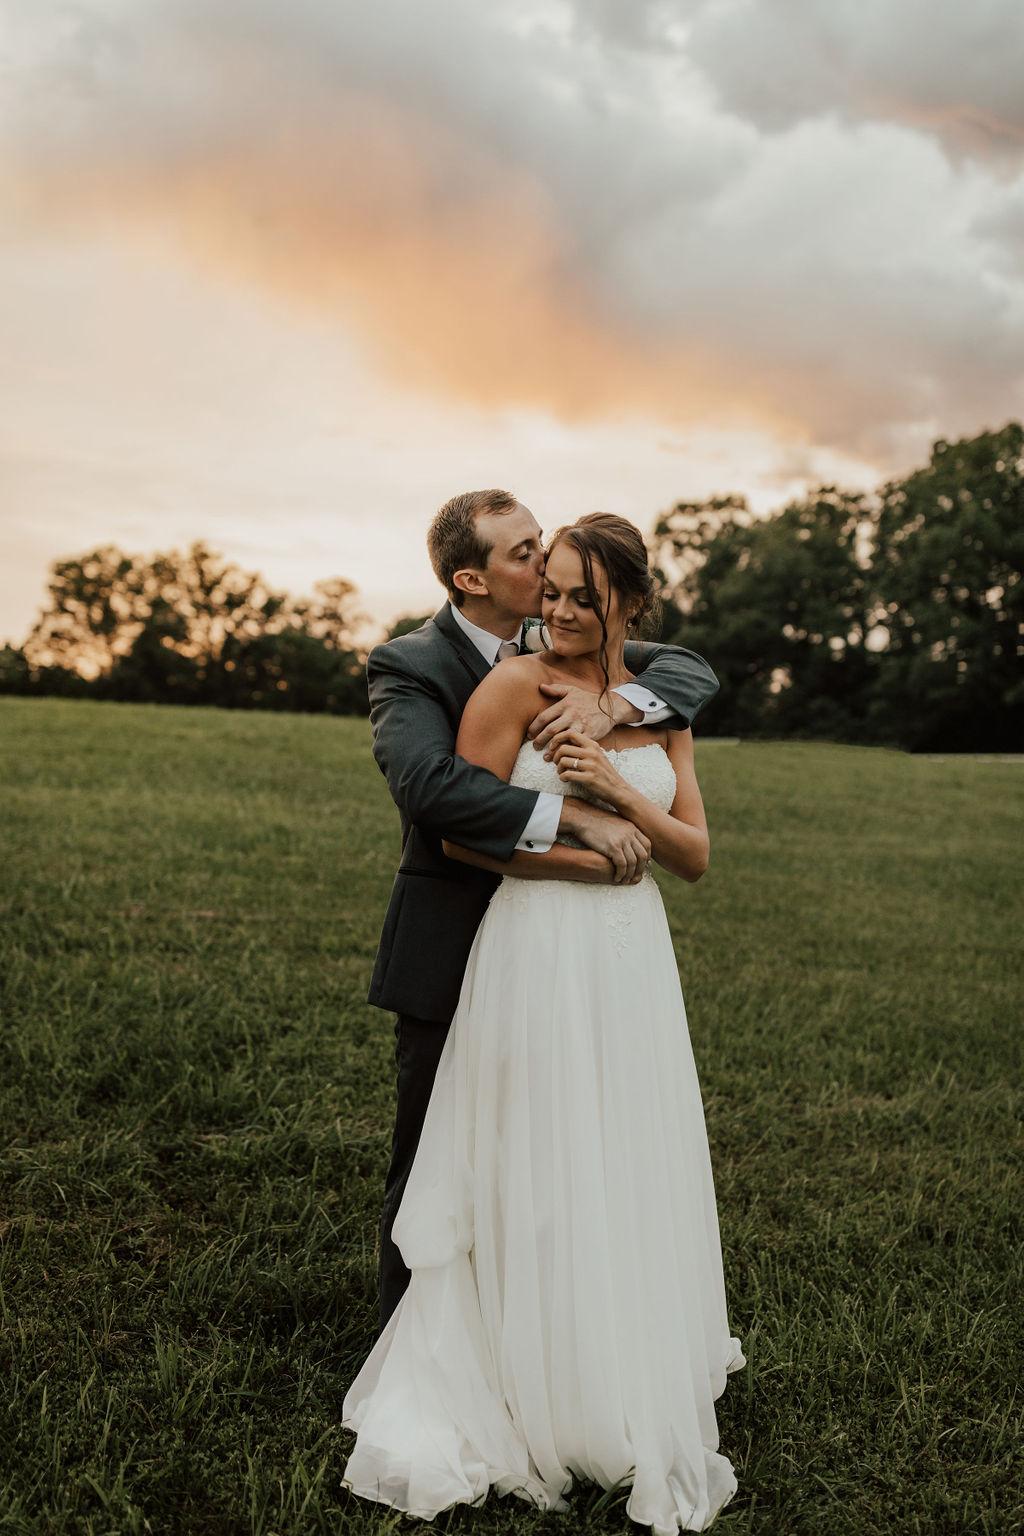 StLouis-Wedding-Photographer-Taylor+Michael-Portraits298.jpg